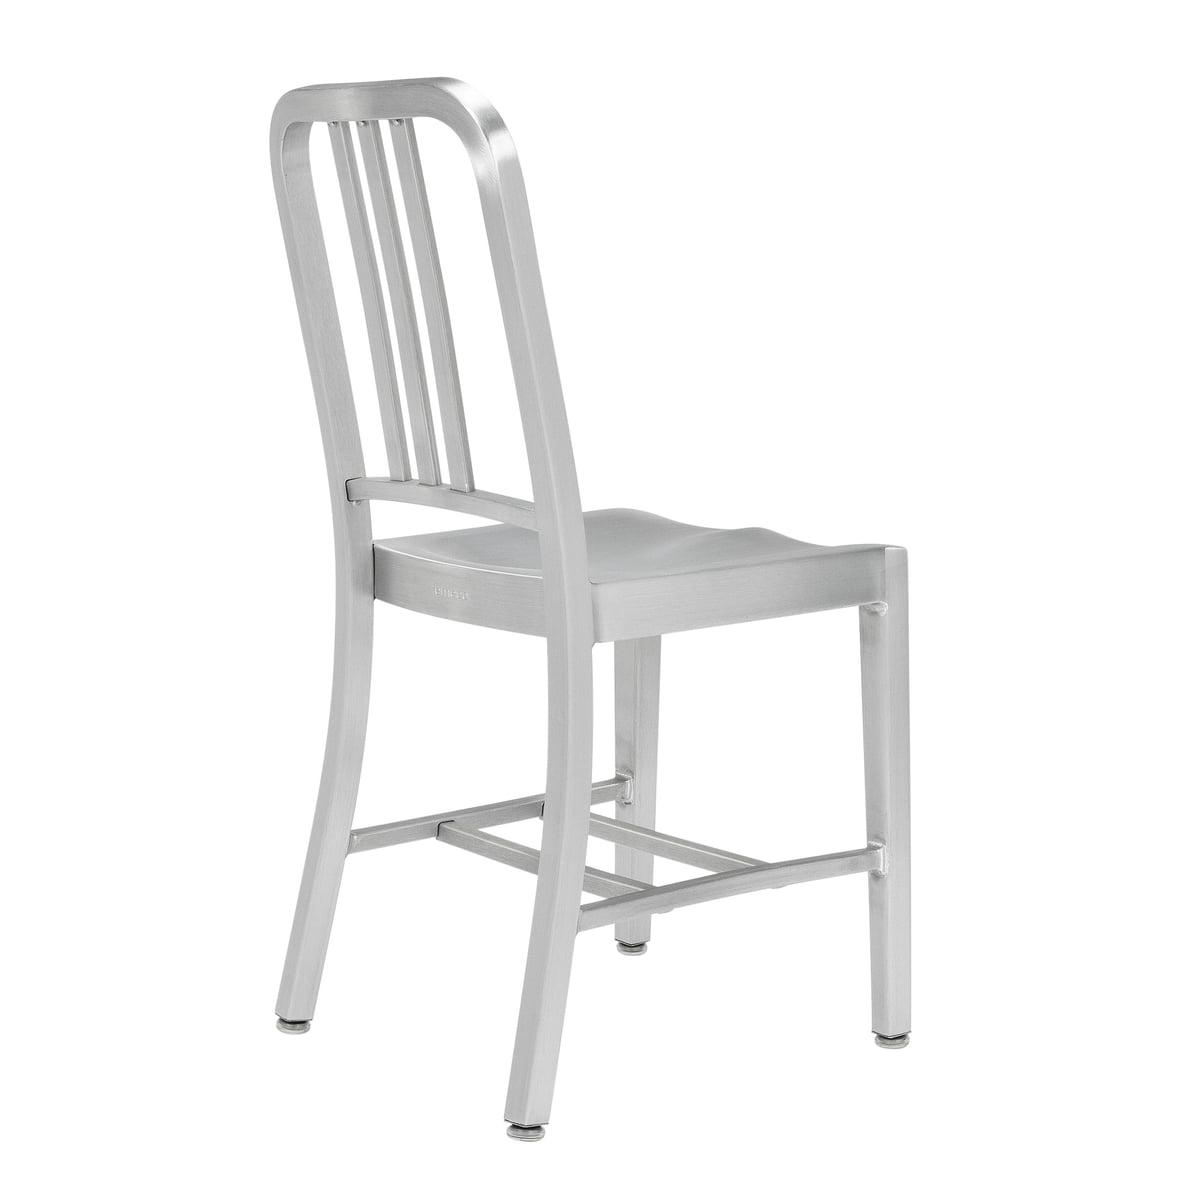 Emeco - Navy Chair | Emeco | Shop